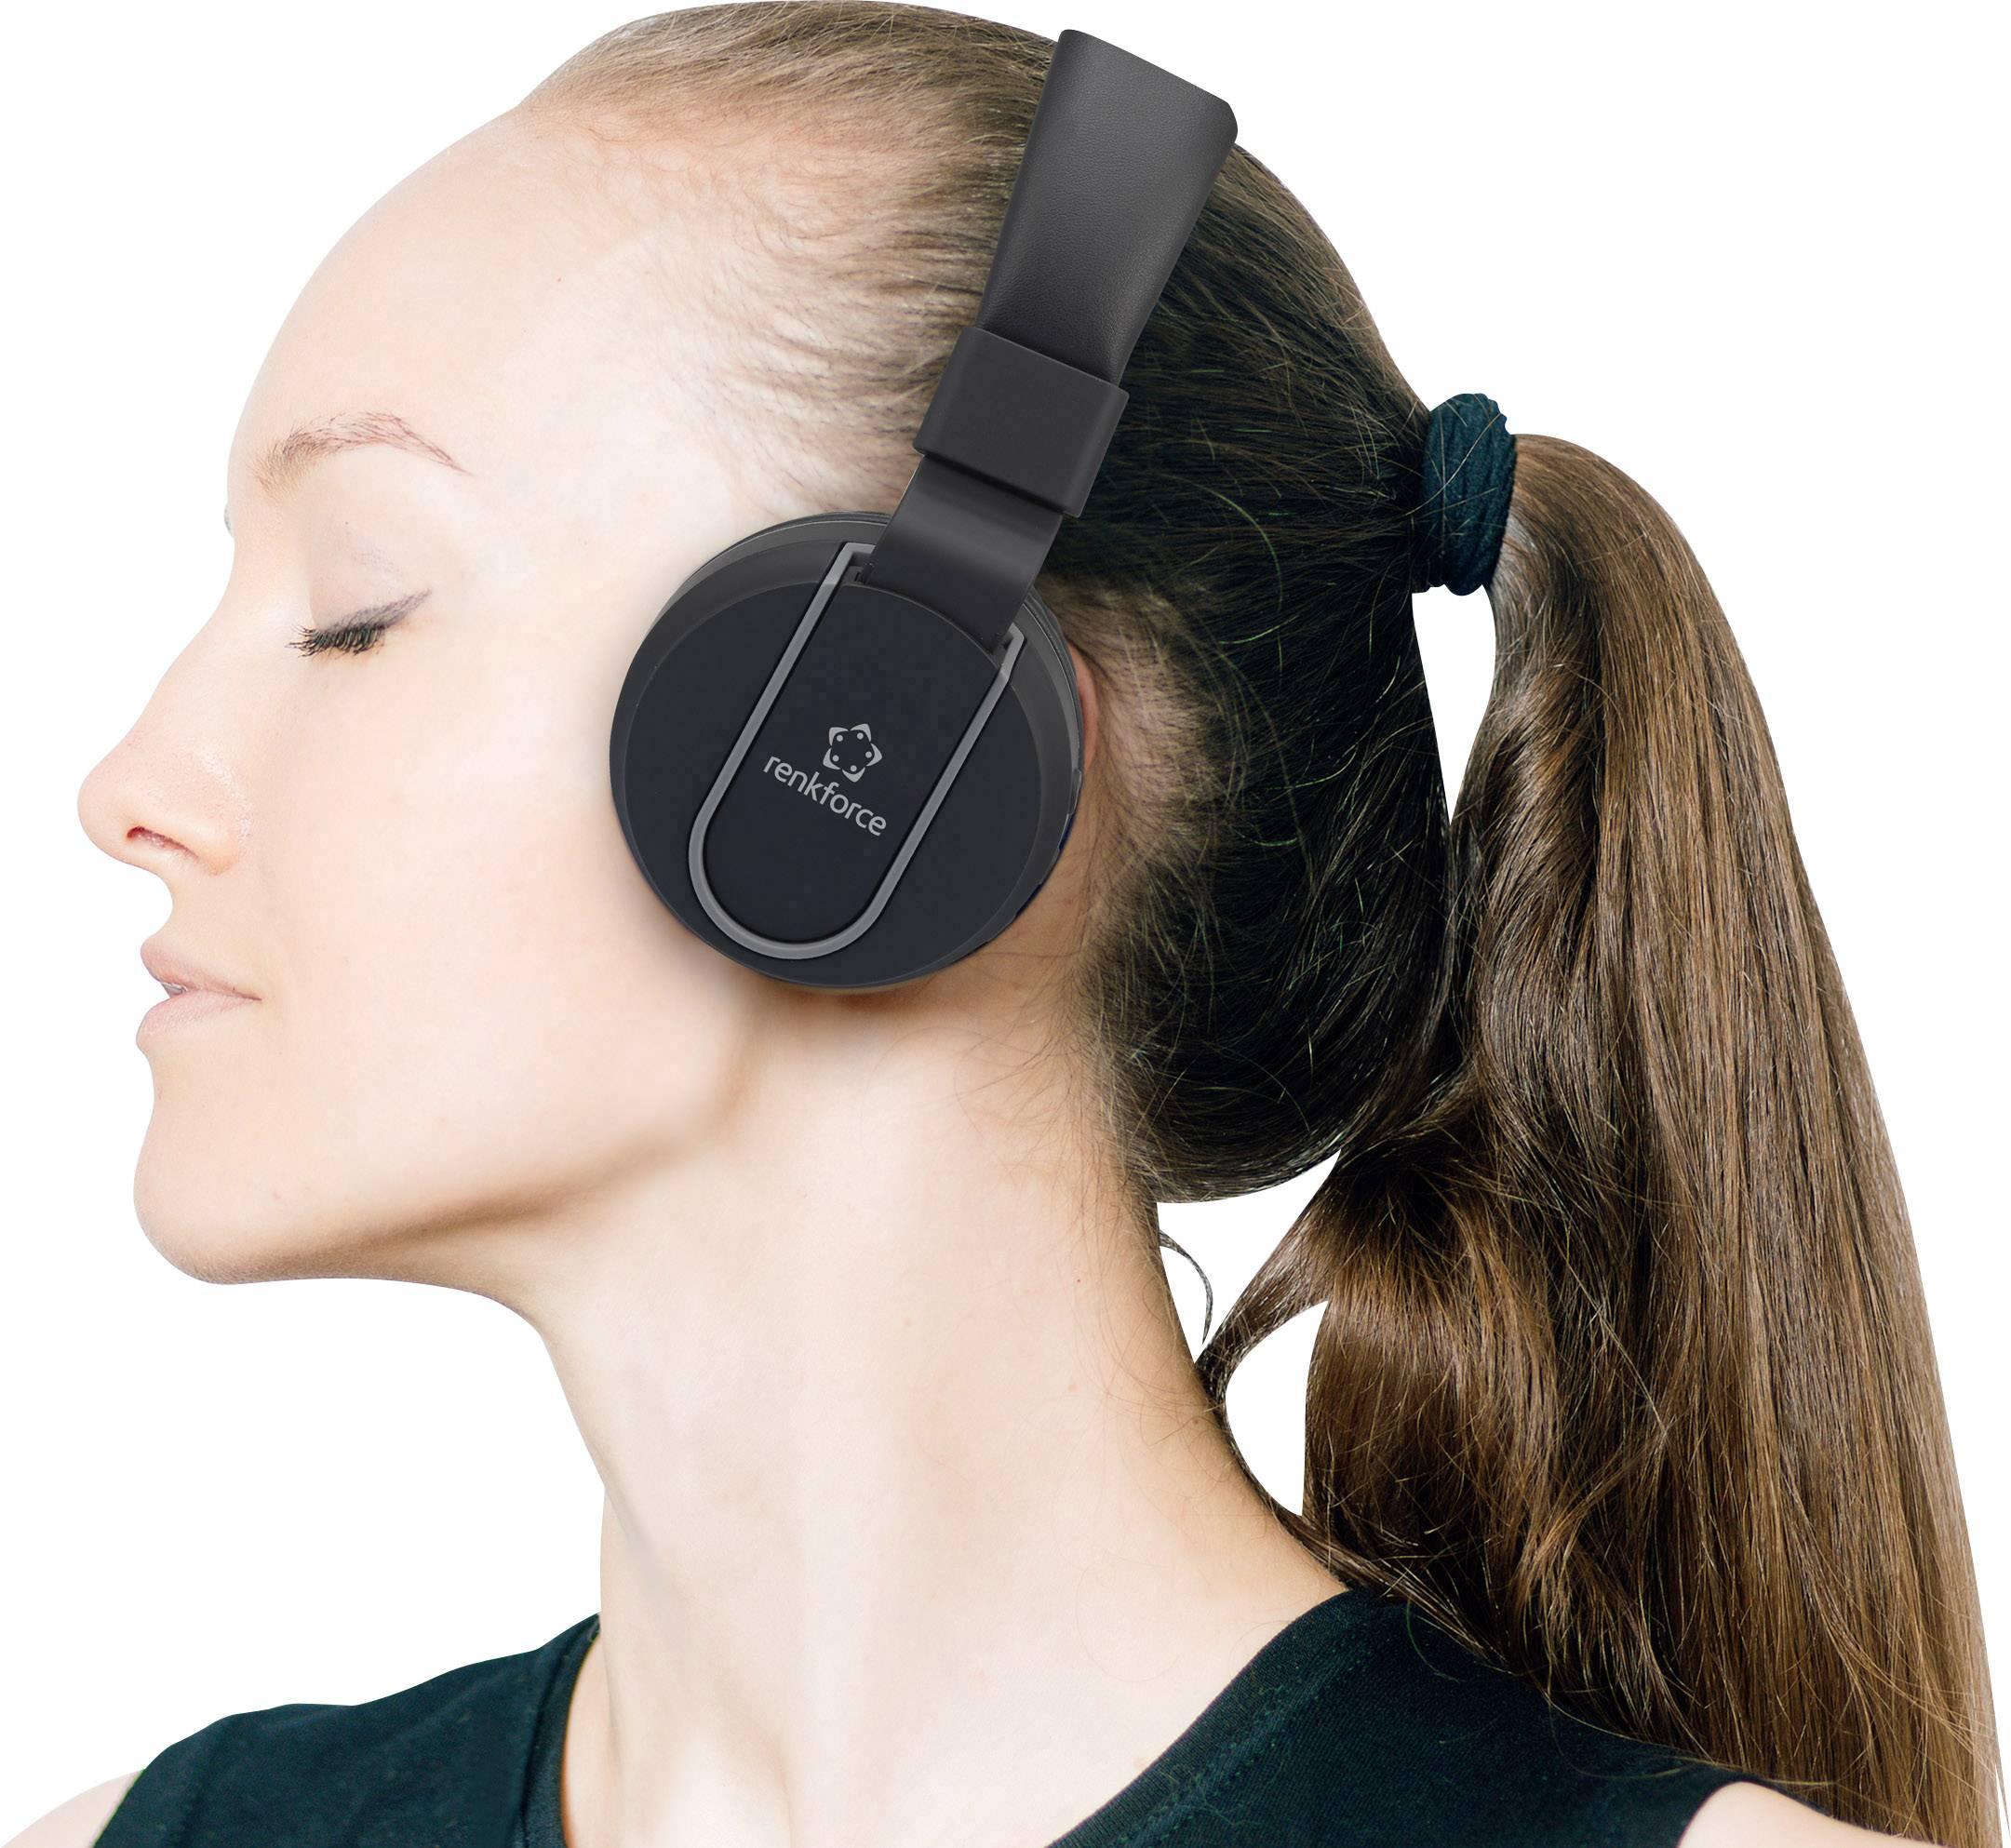 Bluetooth Hi-Fi stereo slúchadlá s mikrofónom Renkforce RF-BTK-100 RF-4731720, čiernosivá